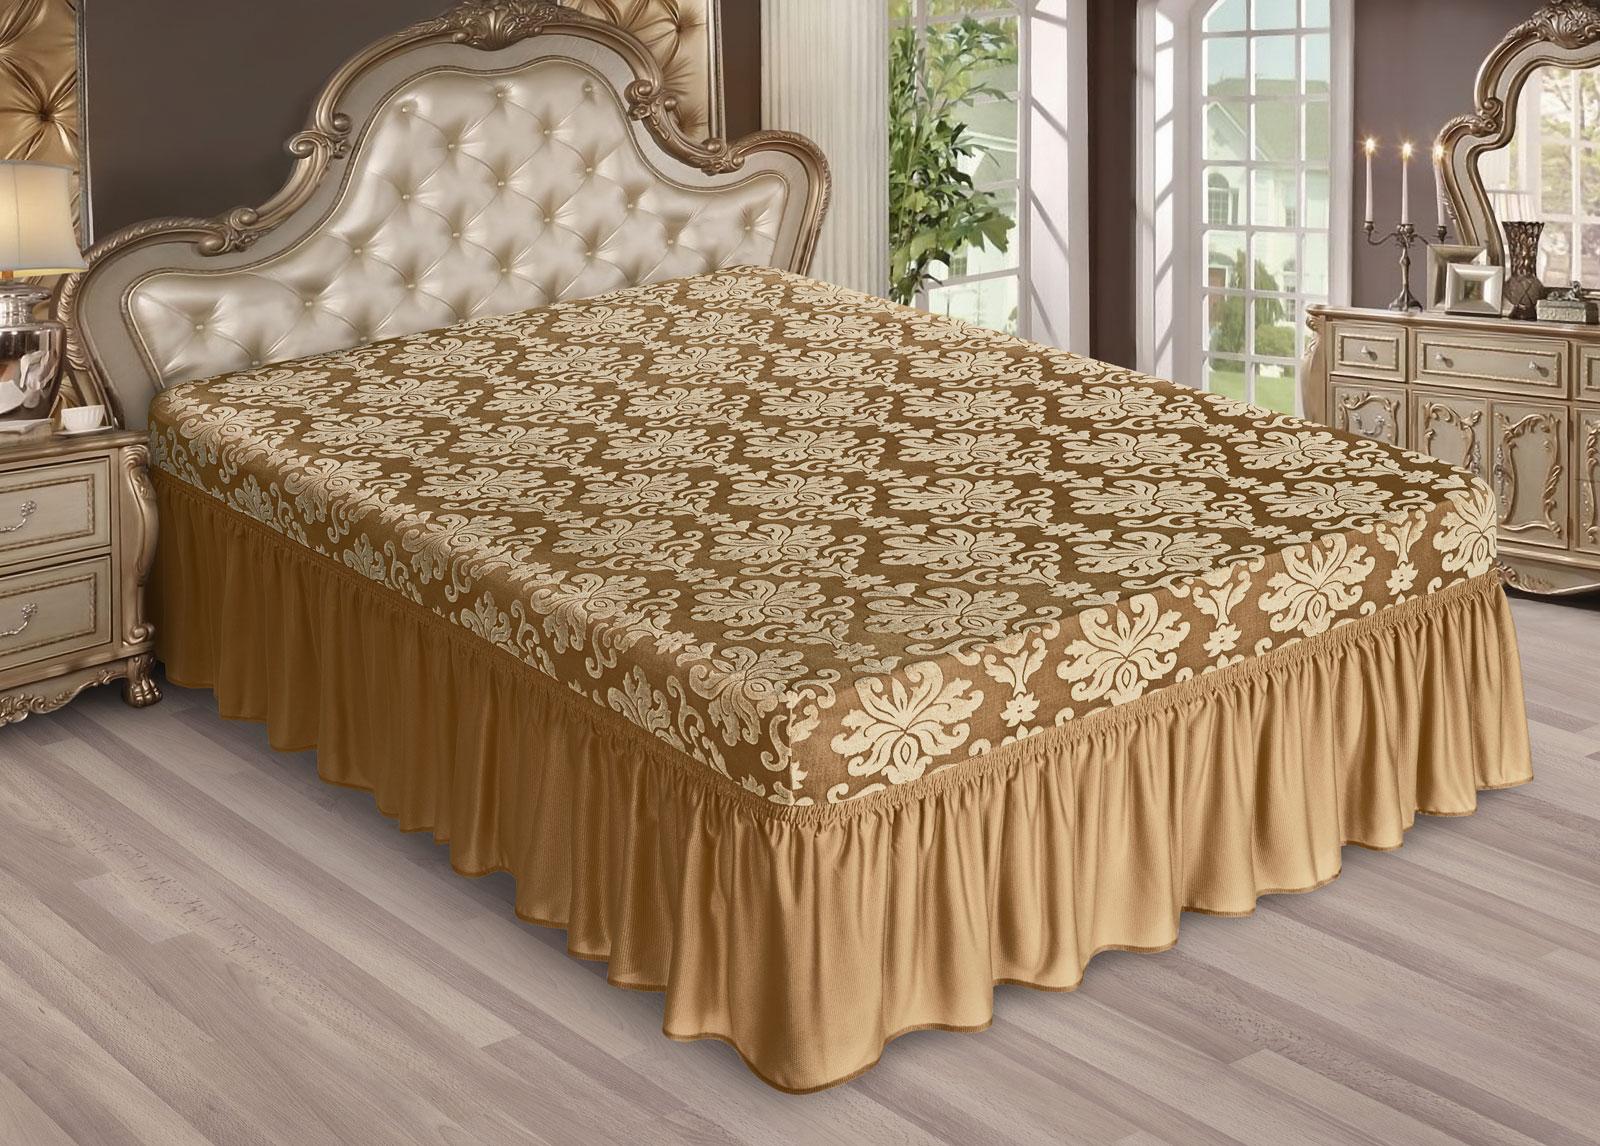 Marianna I.M.A. TEKS Жаккард с оборкой Чехол на кровать 200х200 - Бронза